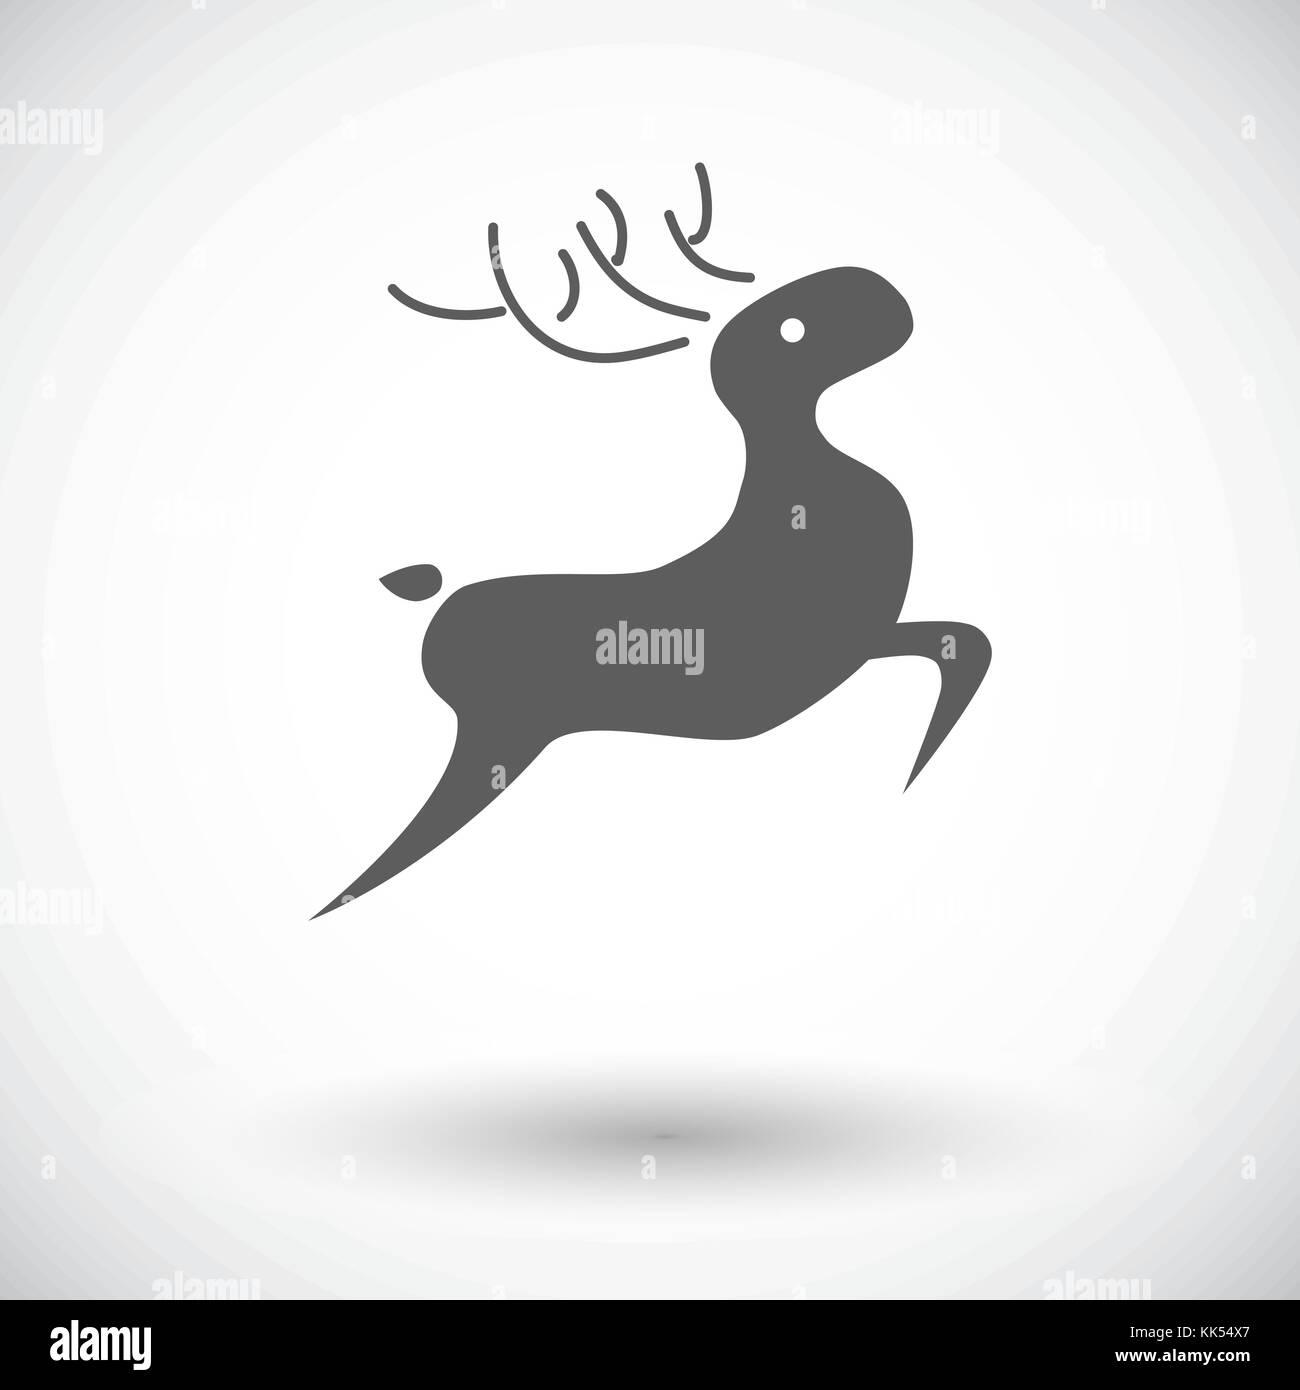 jewish singles in white deer Find great deals on ebay for whitetail deer antlers  white tail deer  this is a beautiful huge free range kansas single 6 point whitetail deer shed antler .